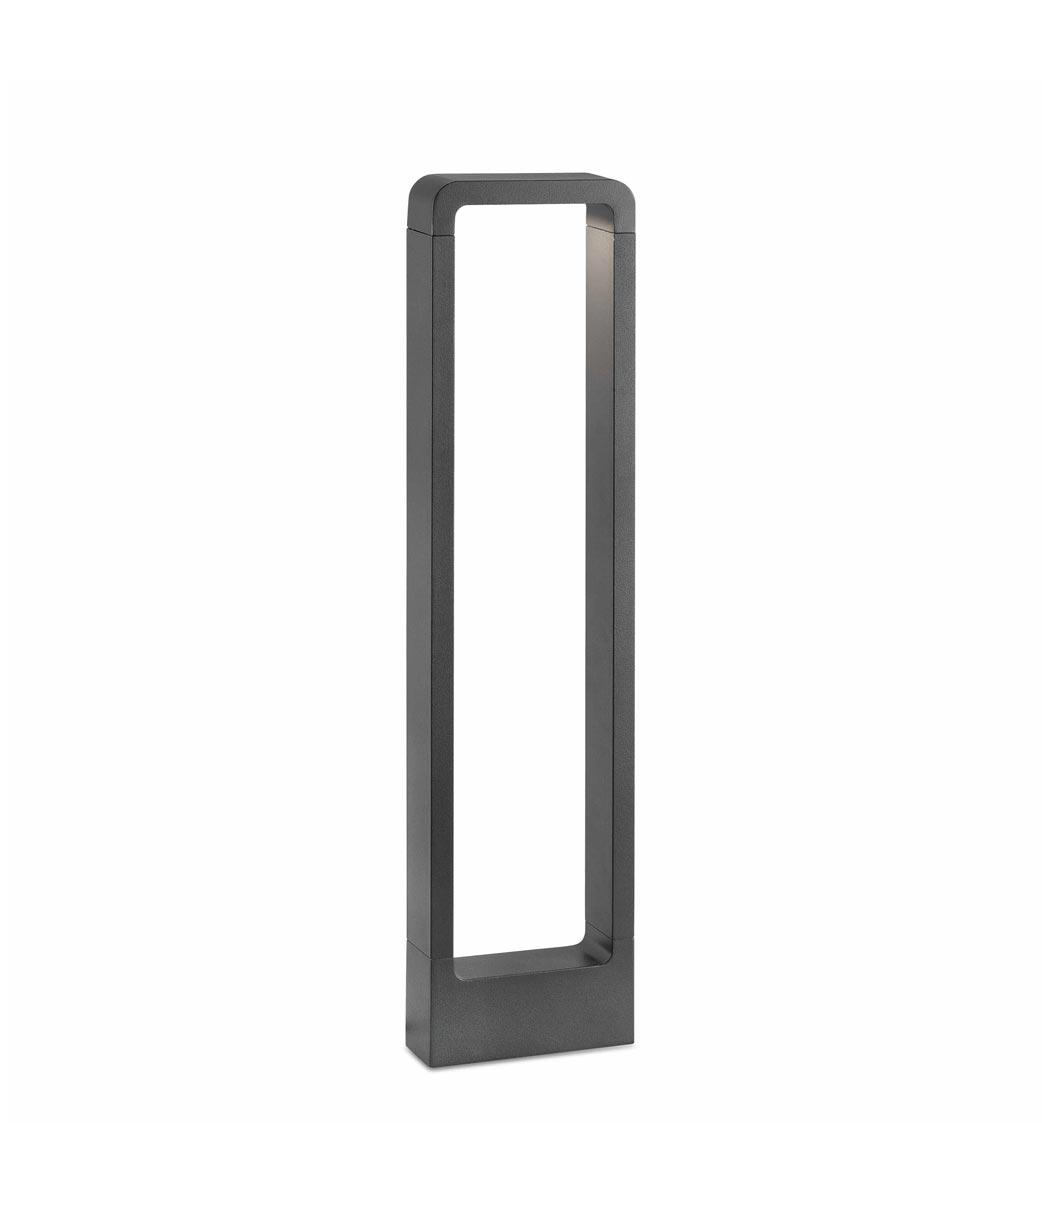 Baliza 65 cm DAS LED gris oscura